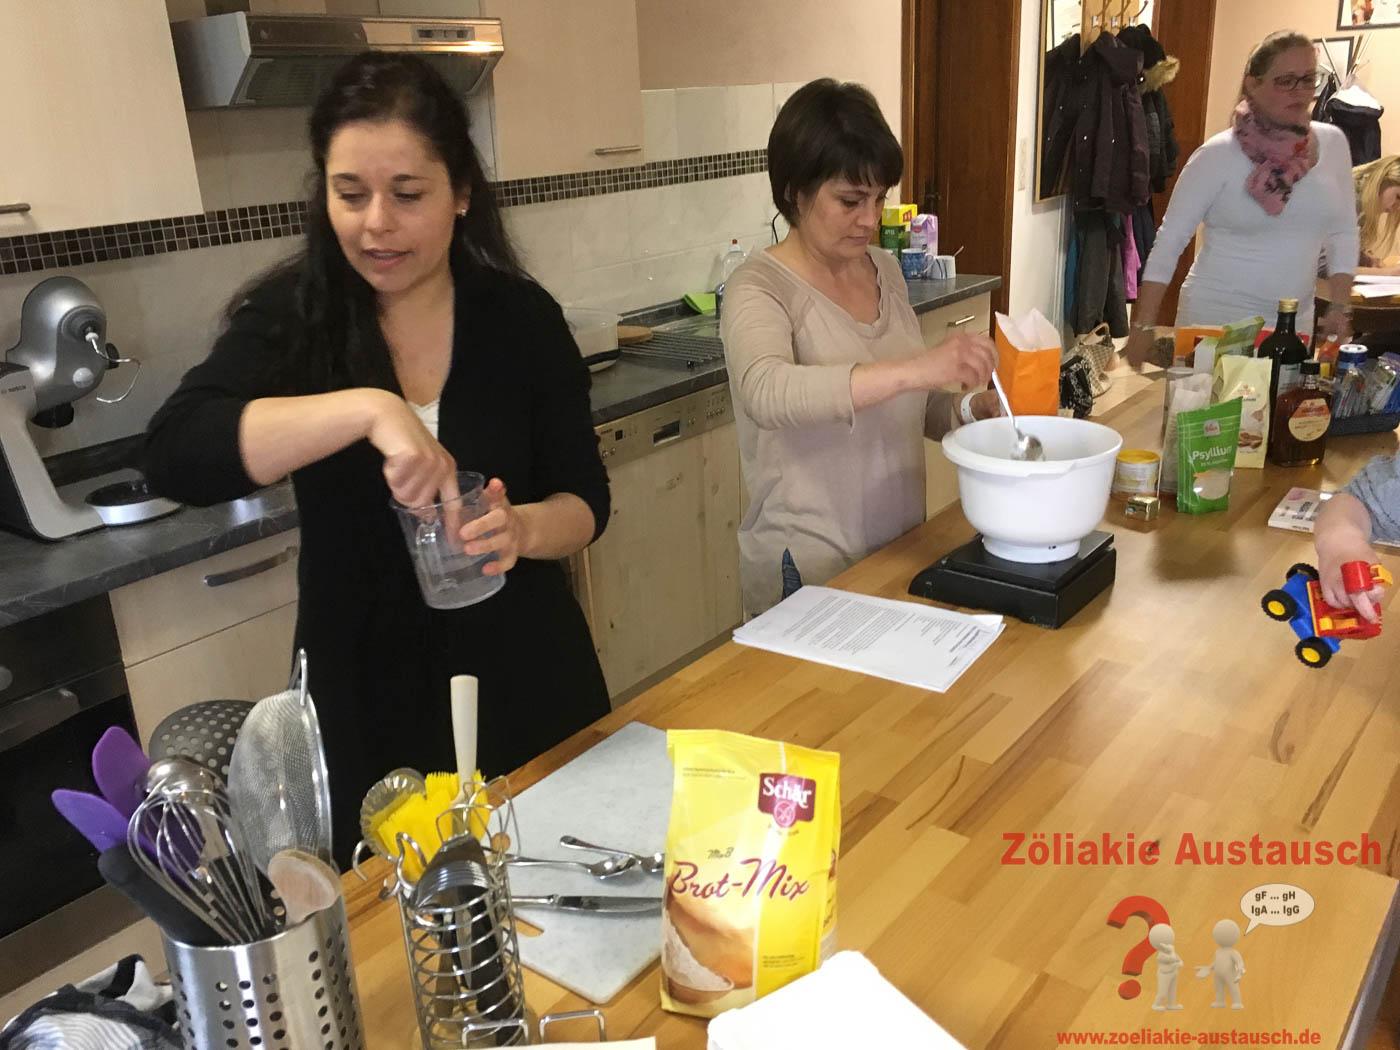 Zoeliakie_Austausch_Tanja_Gruber-Backkurs_2017-007